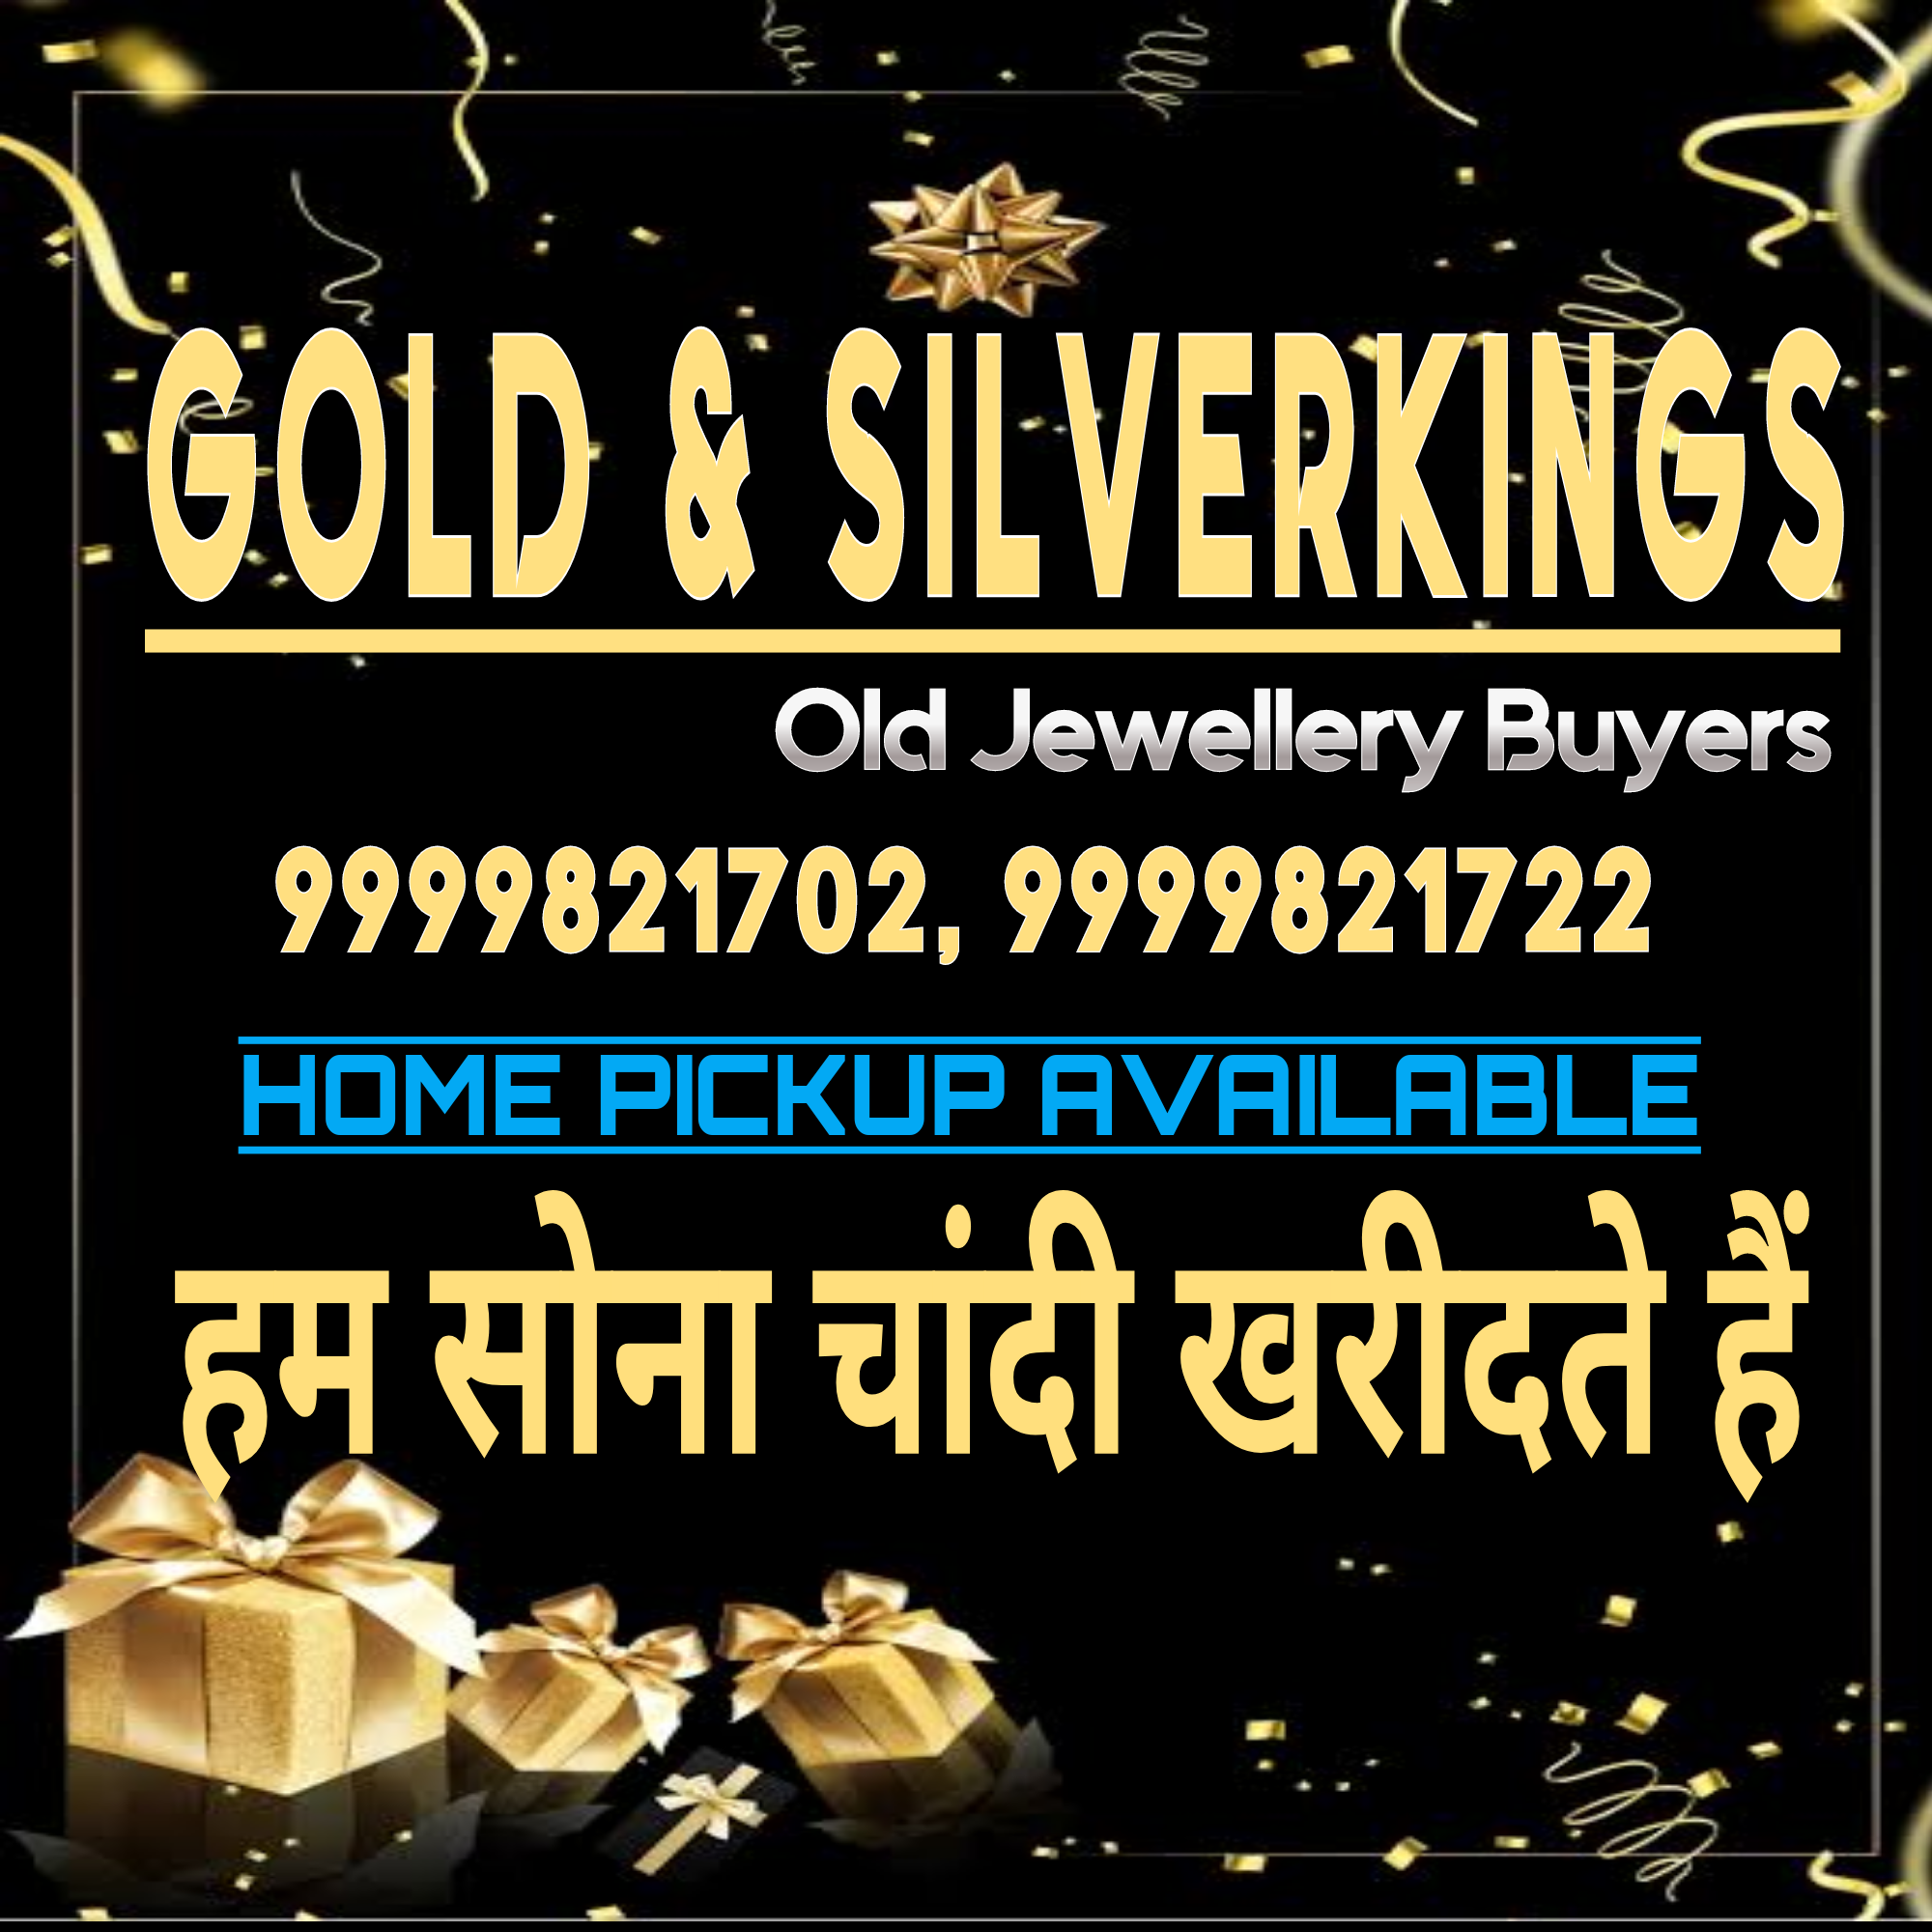 Sell scrap silver